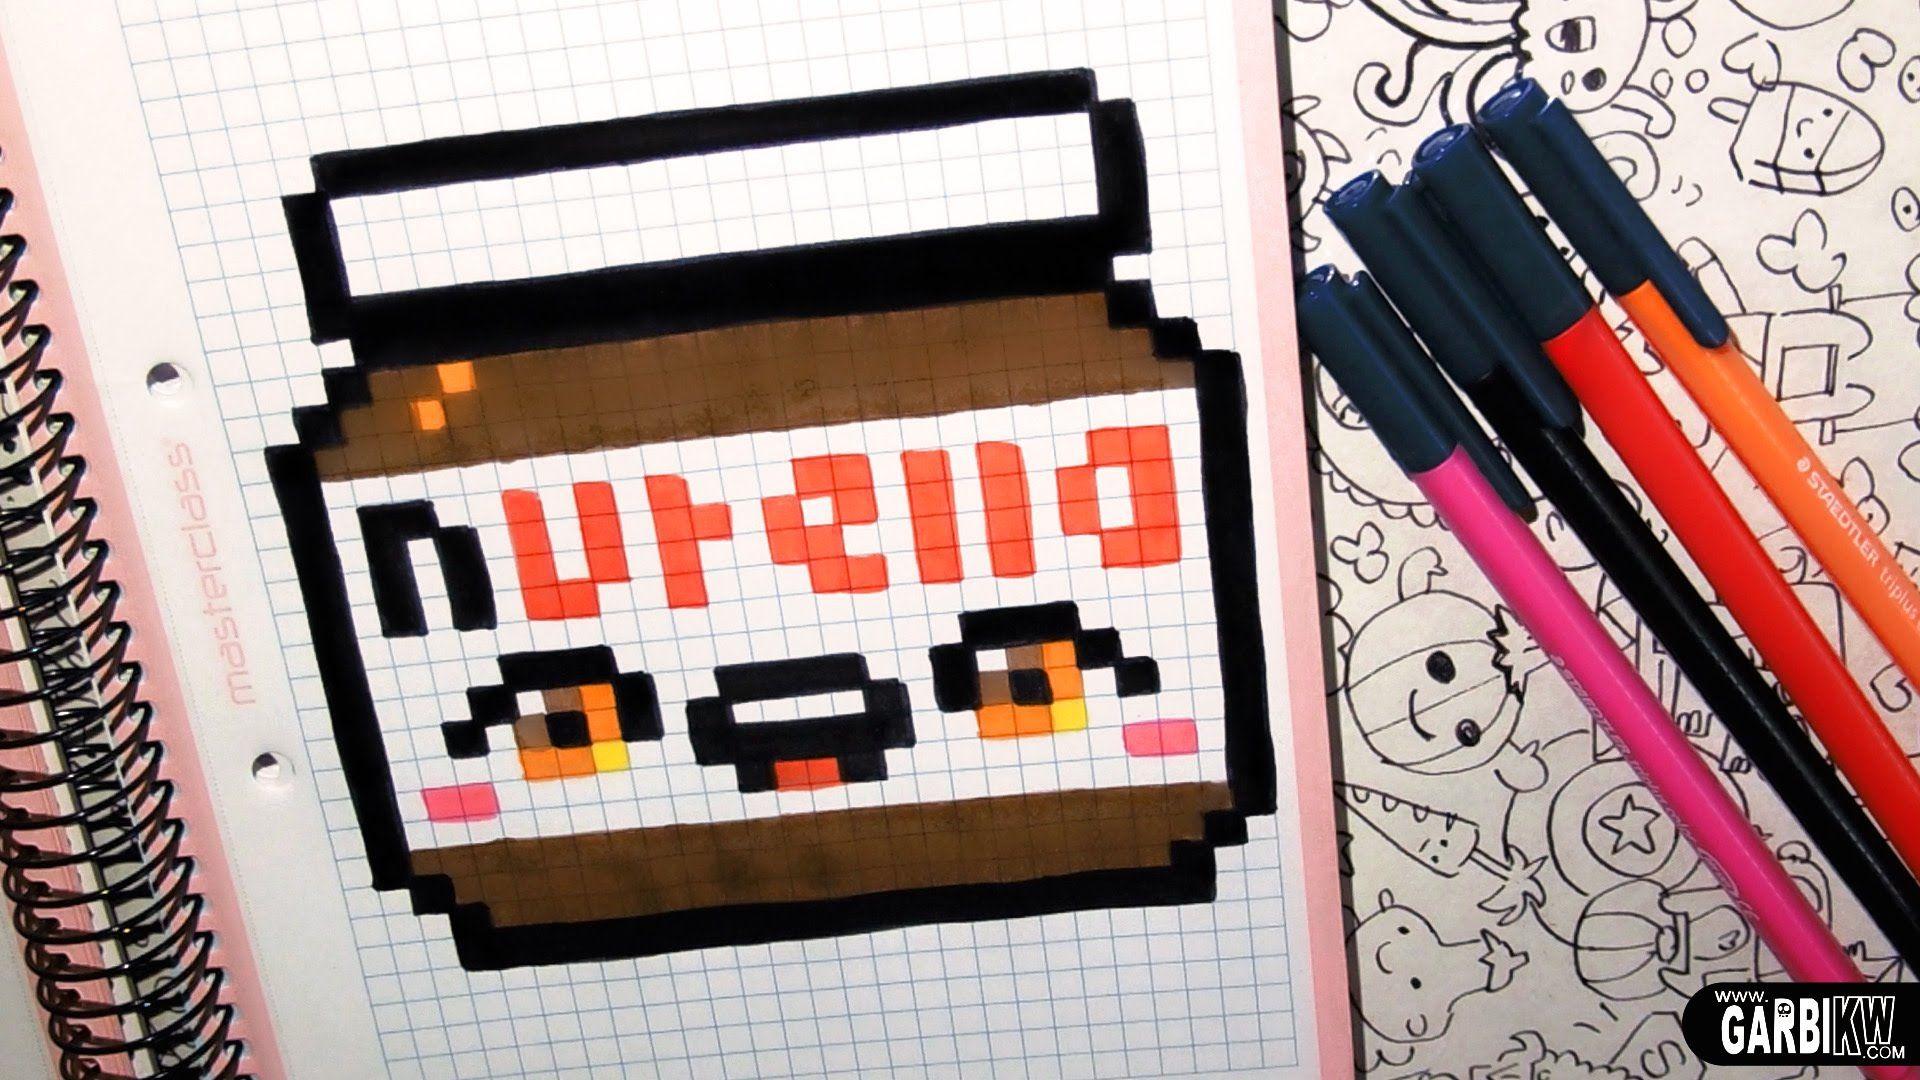 Handmade Pixel Art How To Draw A Kawaii Nutella By Garbi Kw